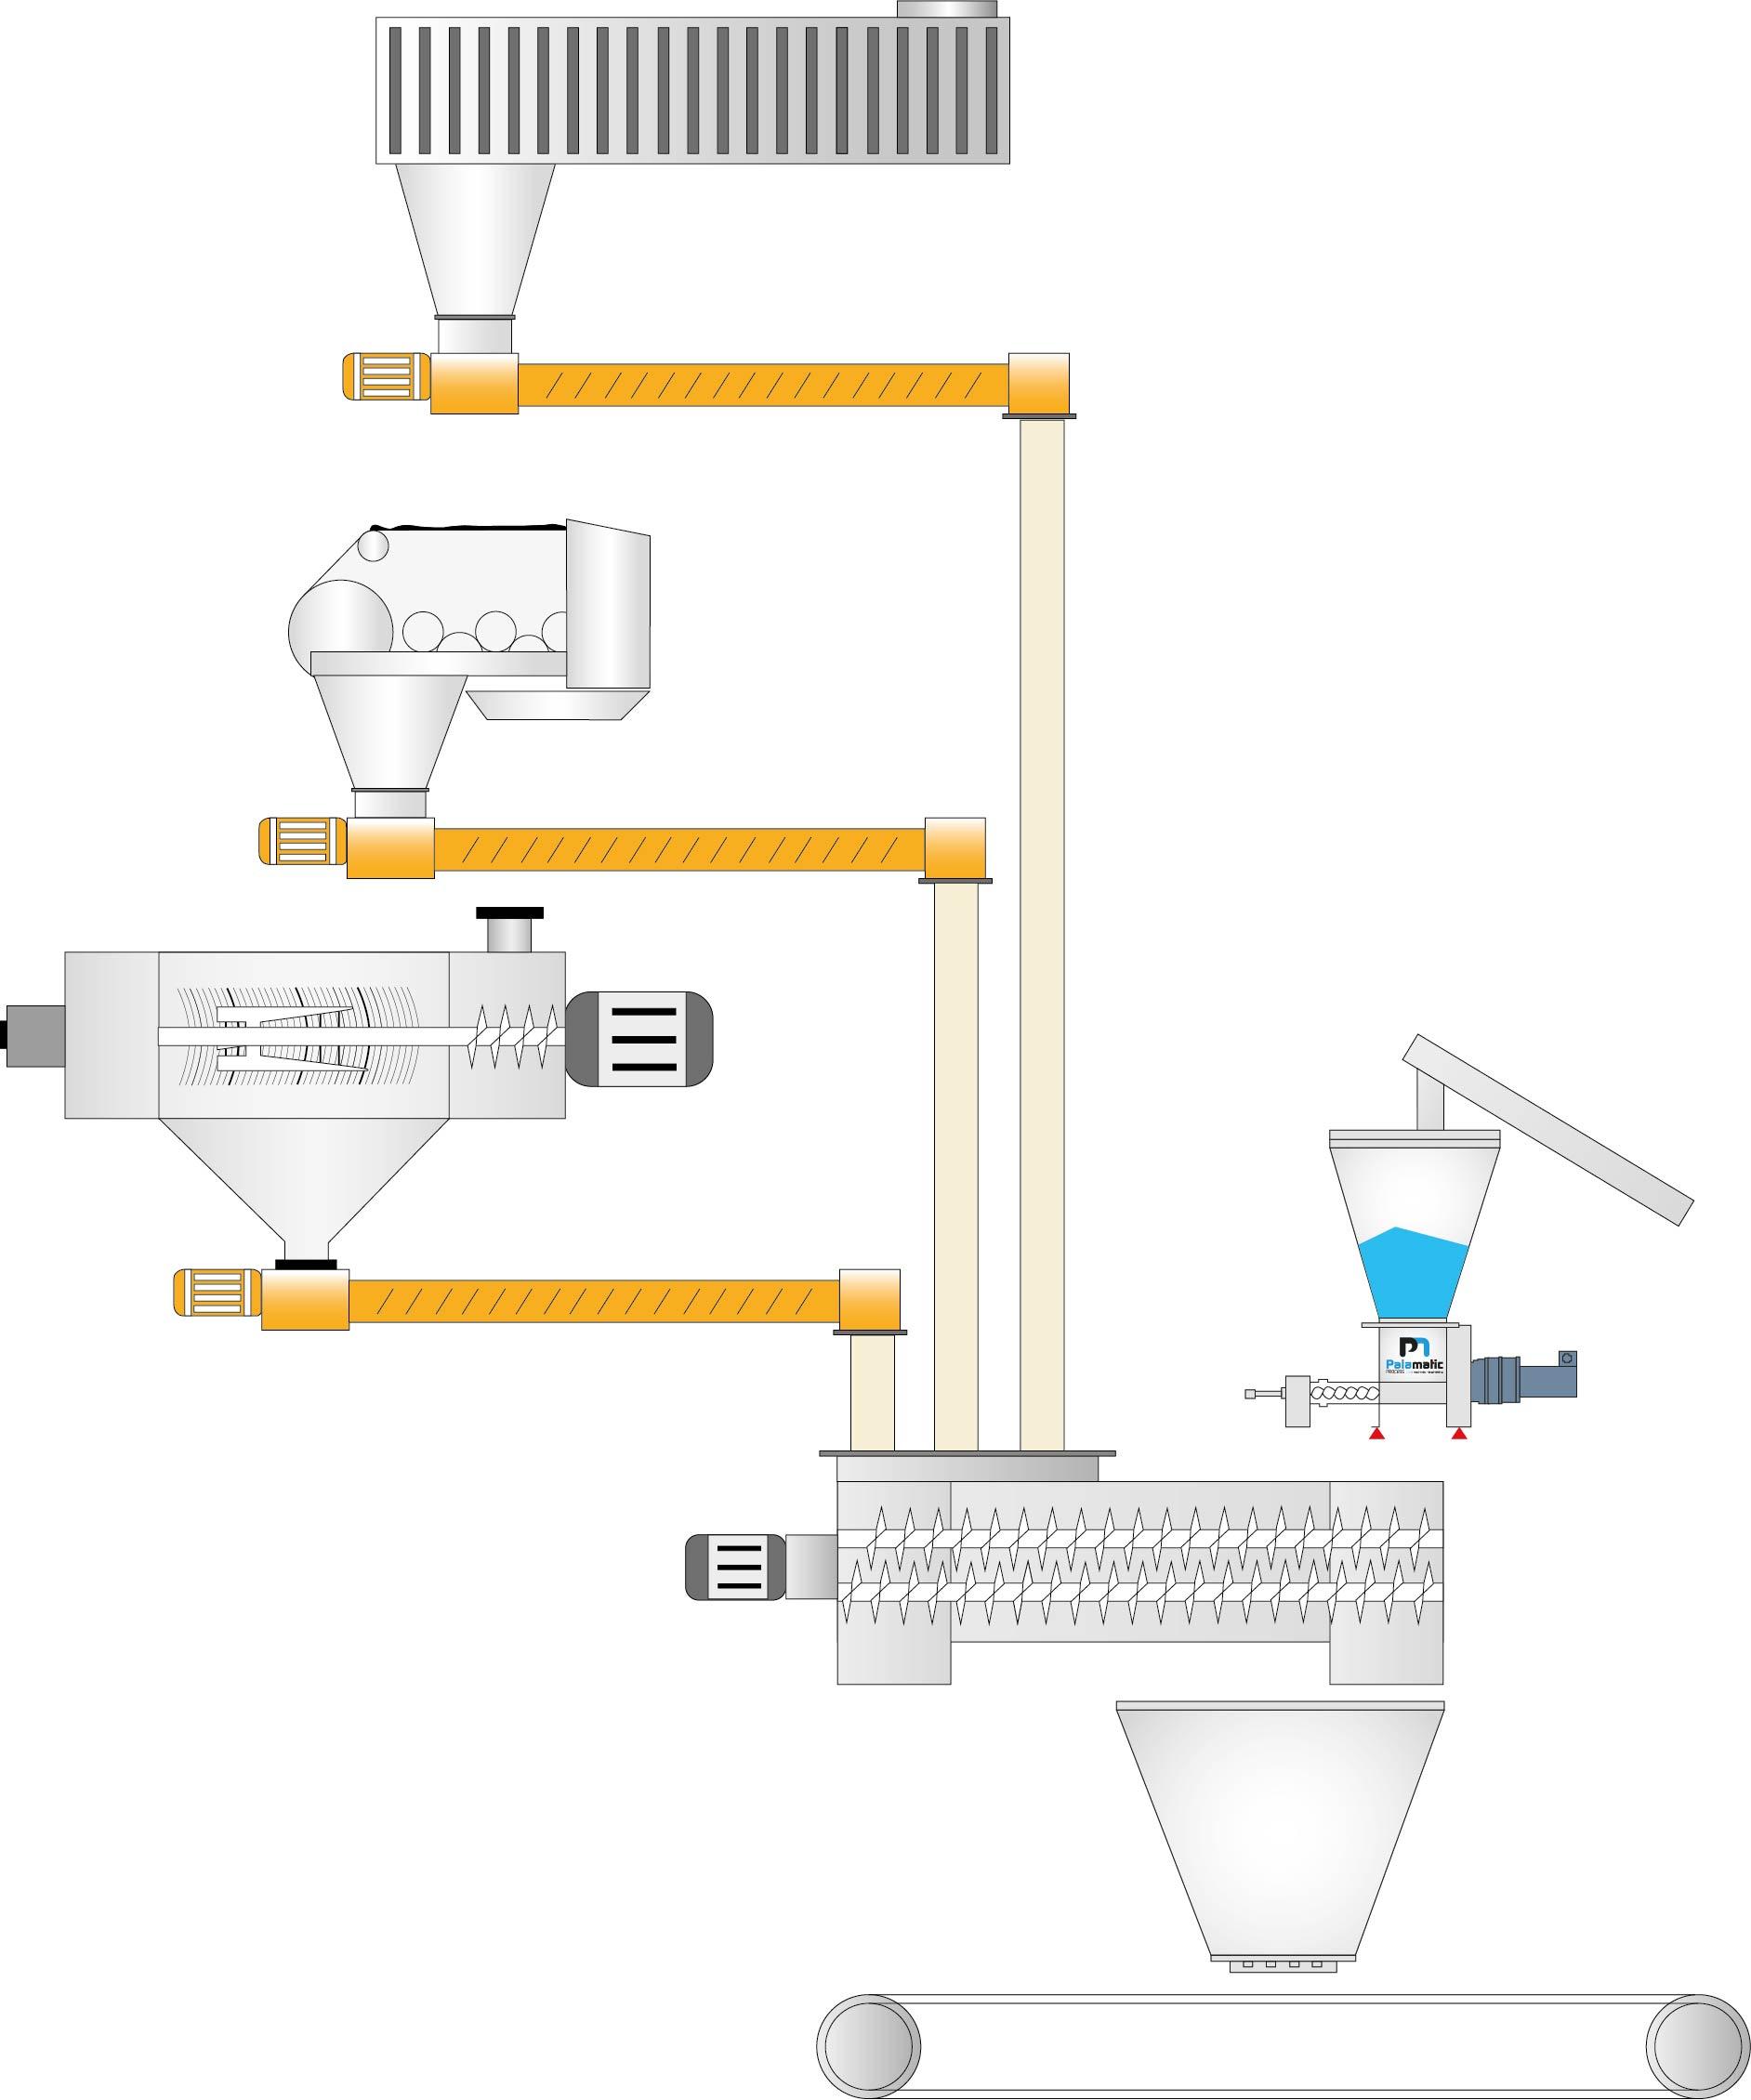 sludge traitement layout